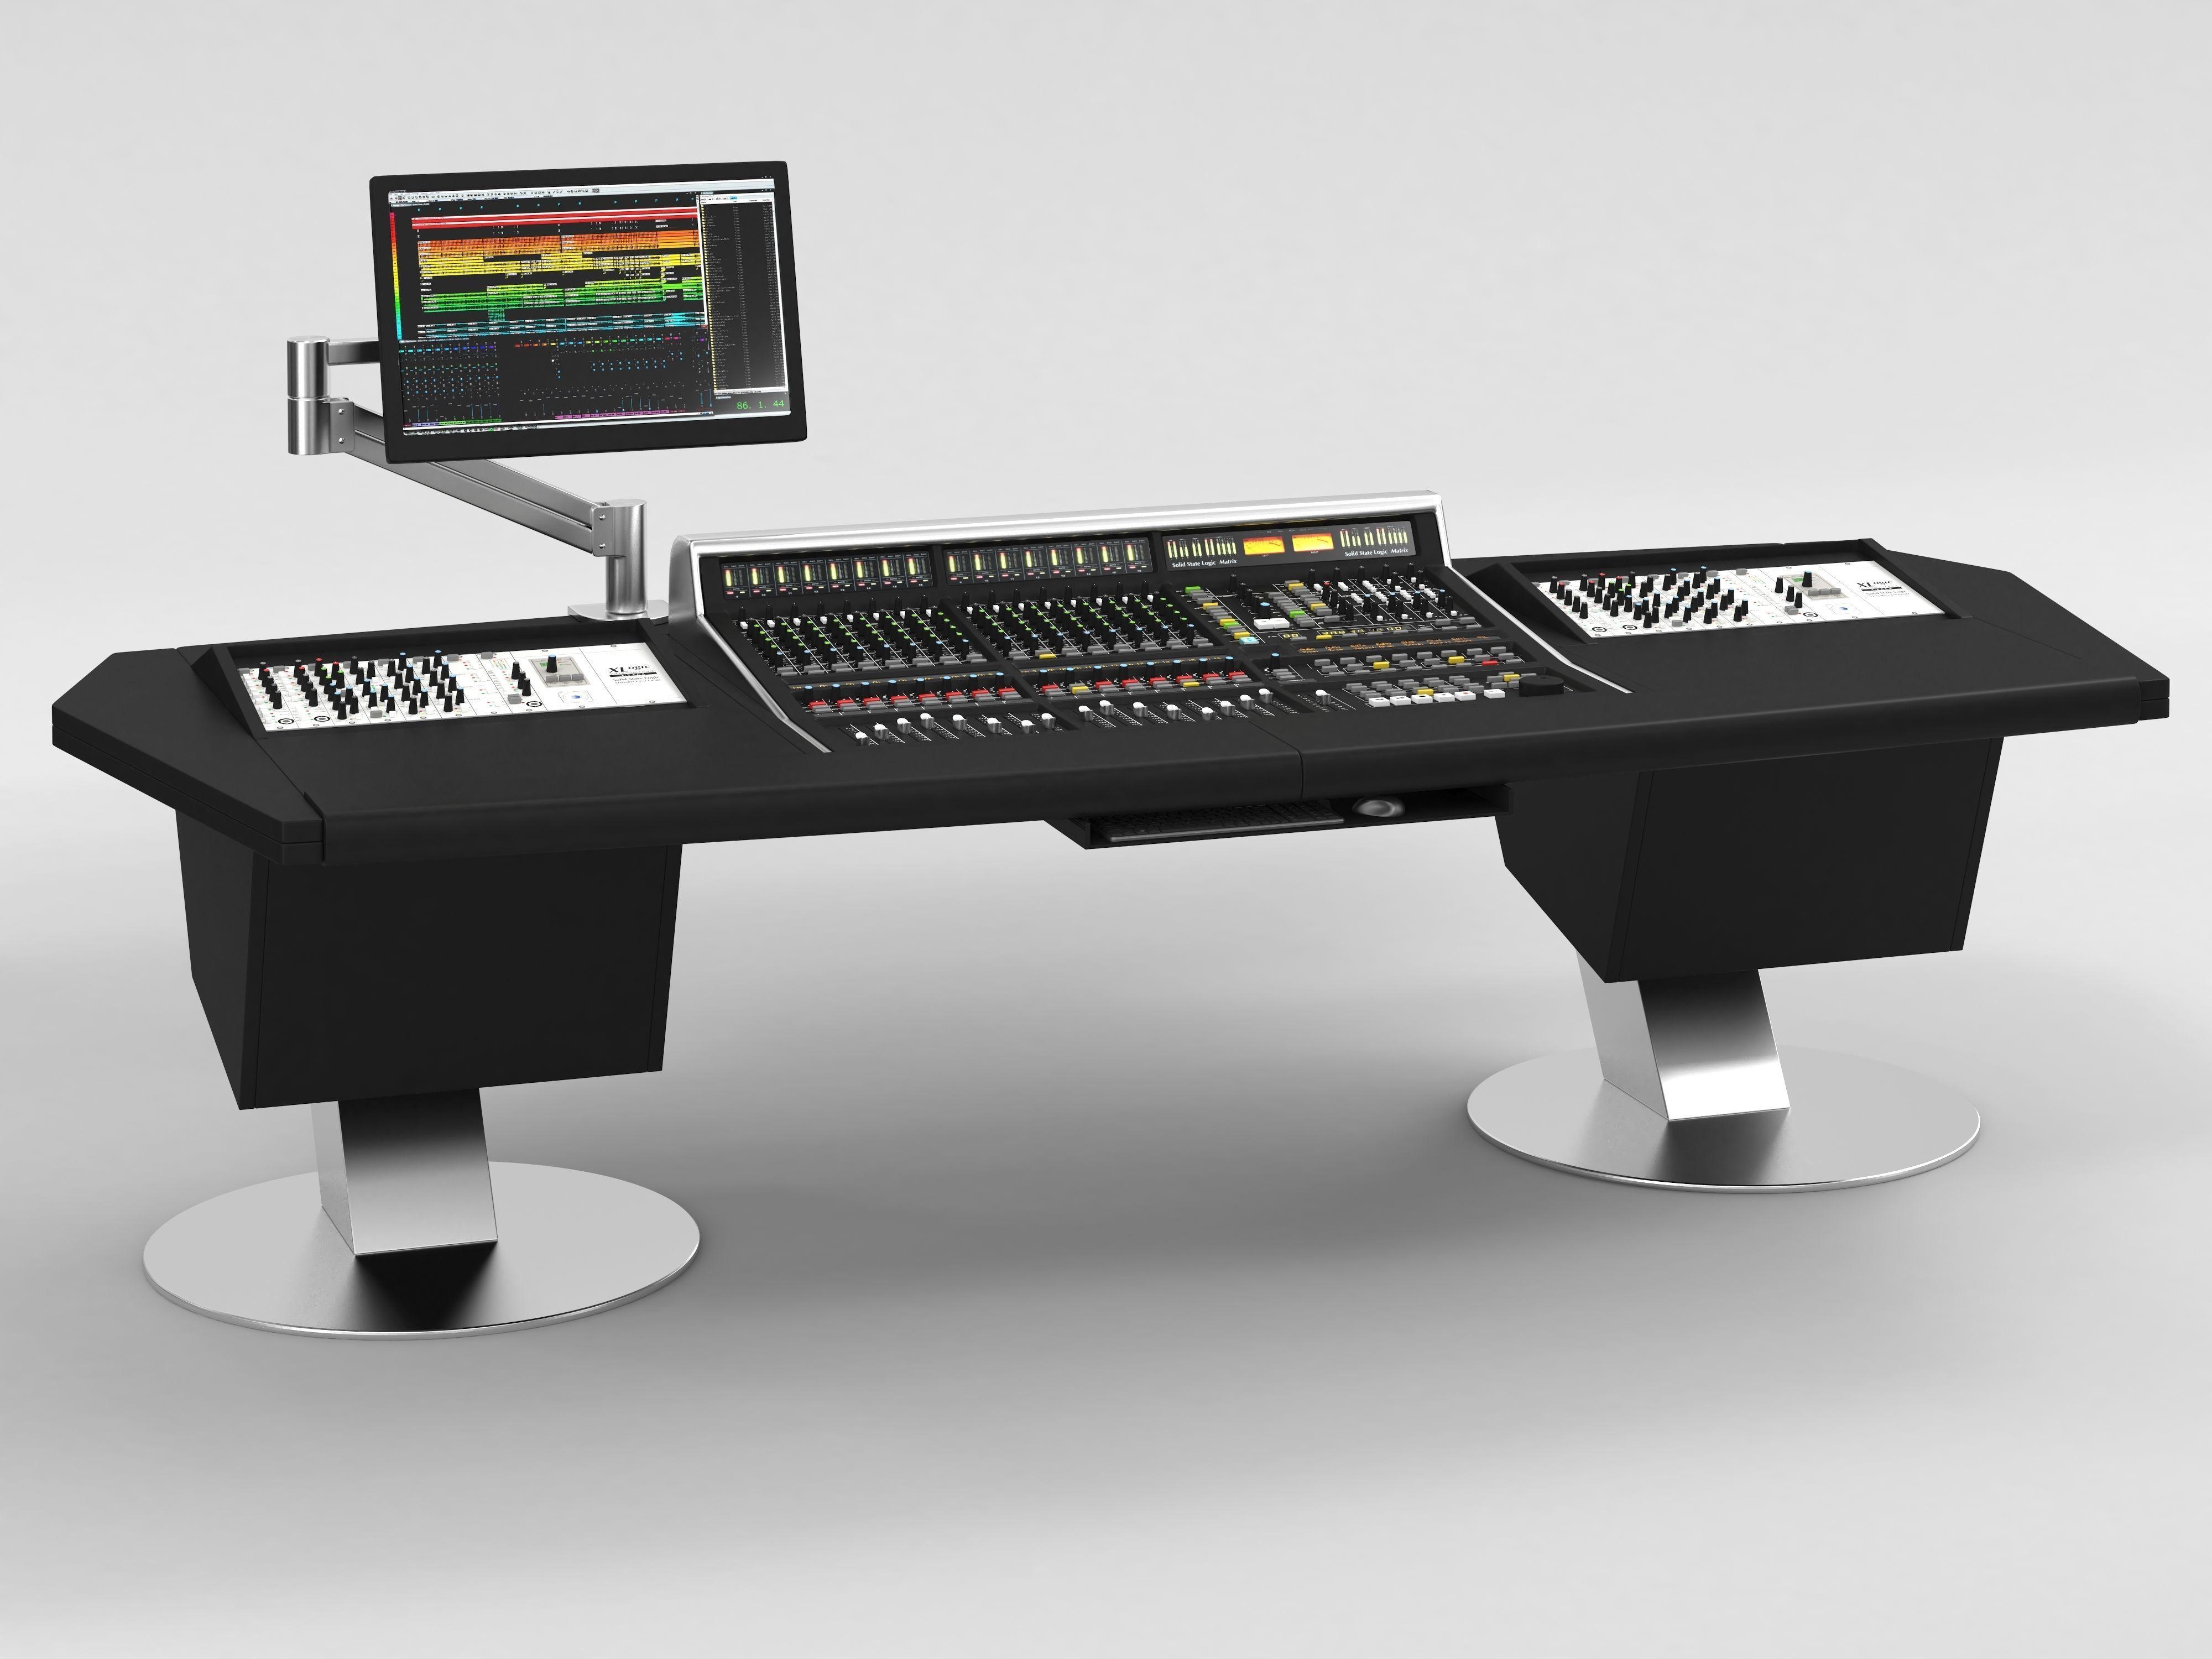 Solid State Logic Matrix console studio controller